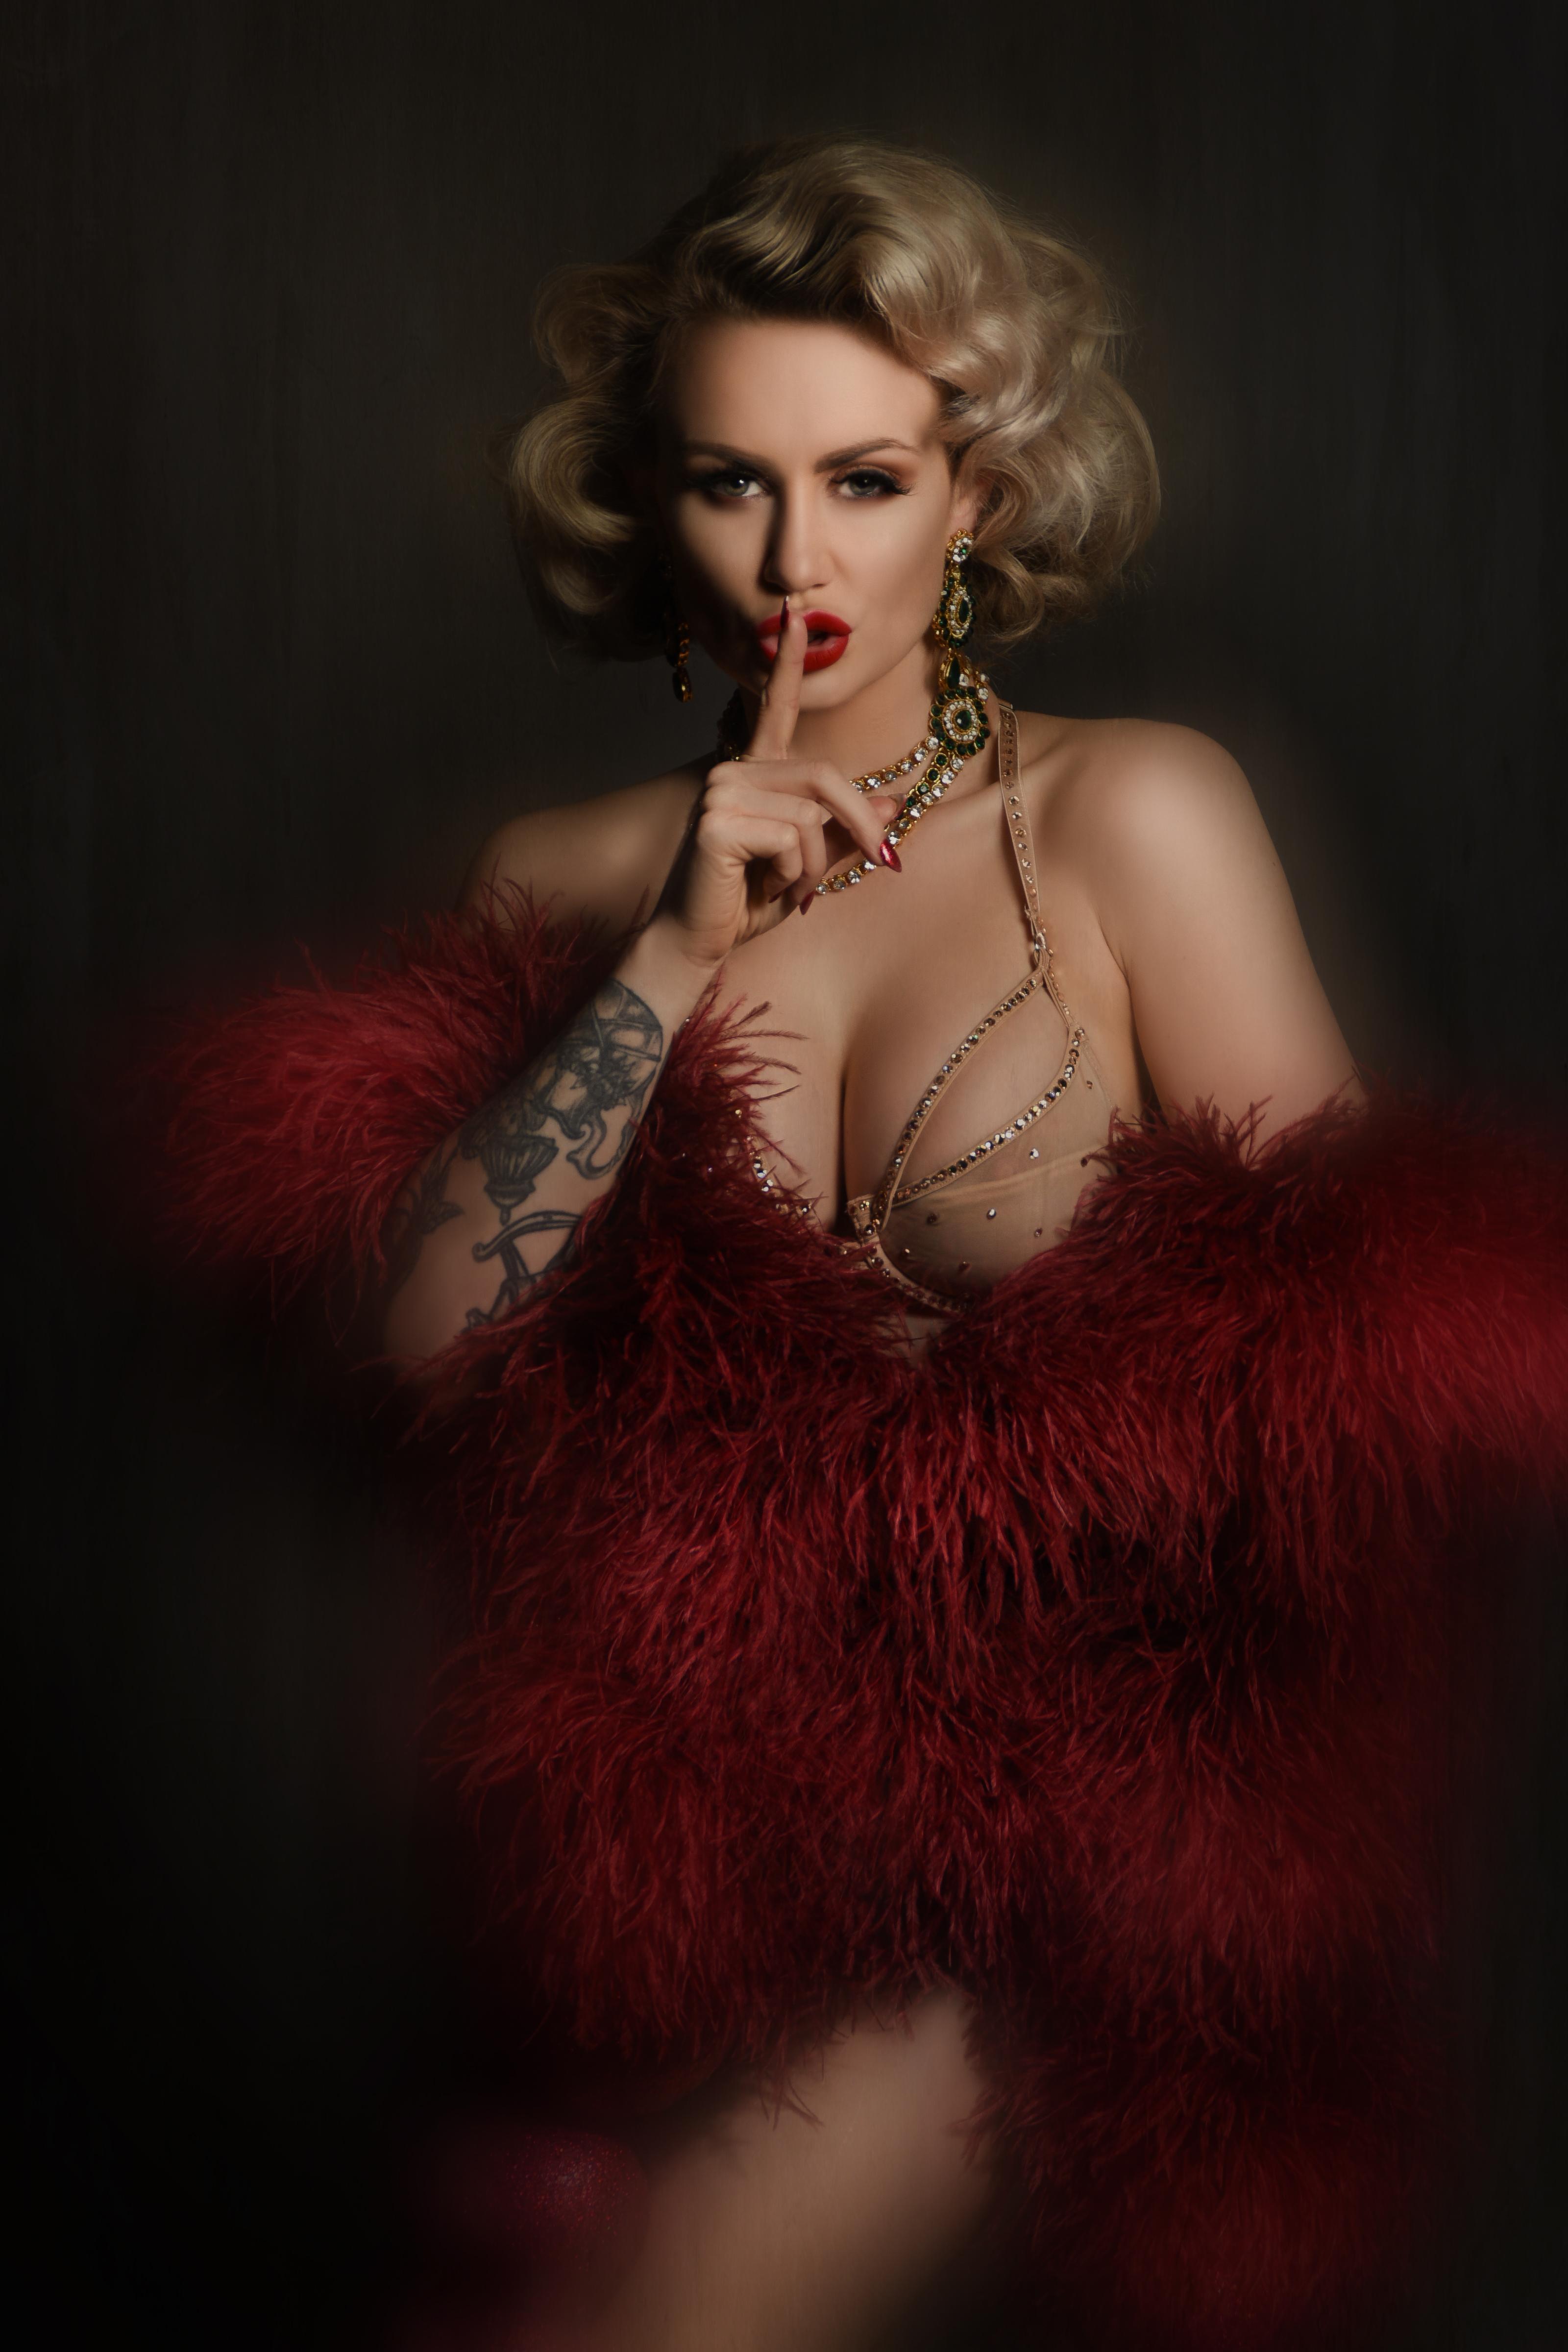 Miss Constance Peach